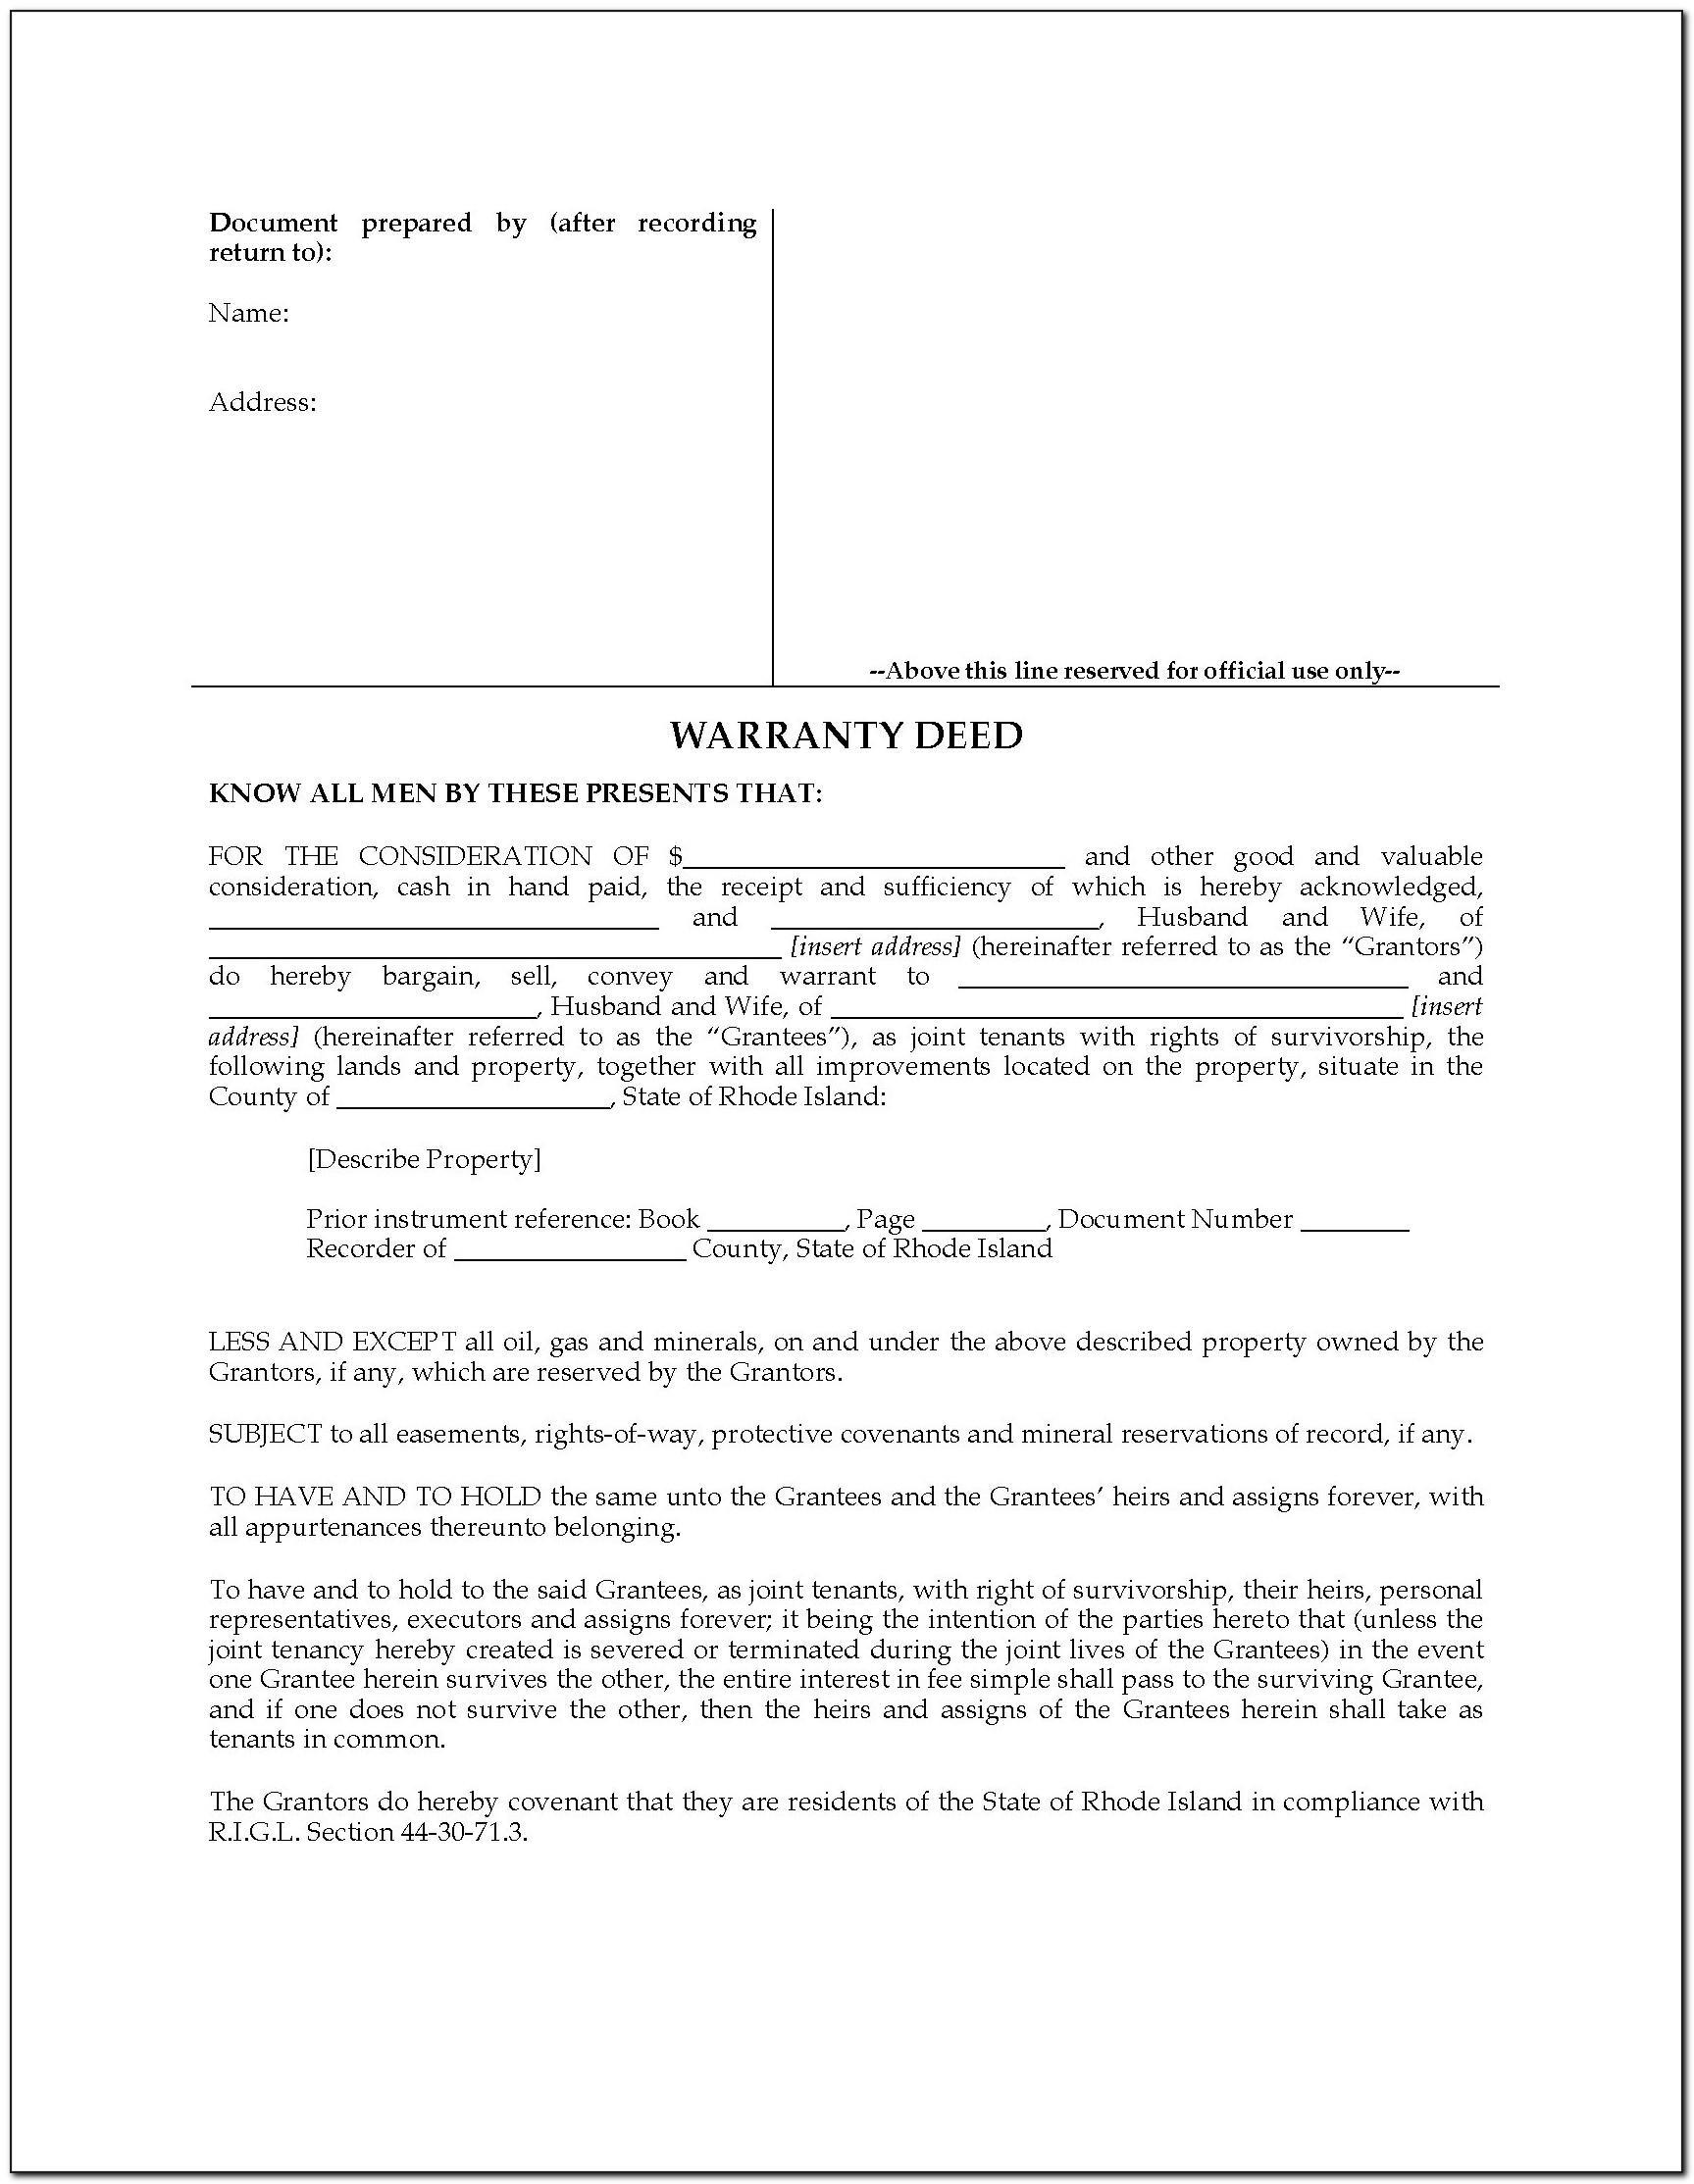 Oklahoma Joint Tenancy Warranty Deed Form